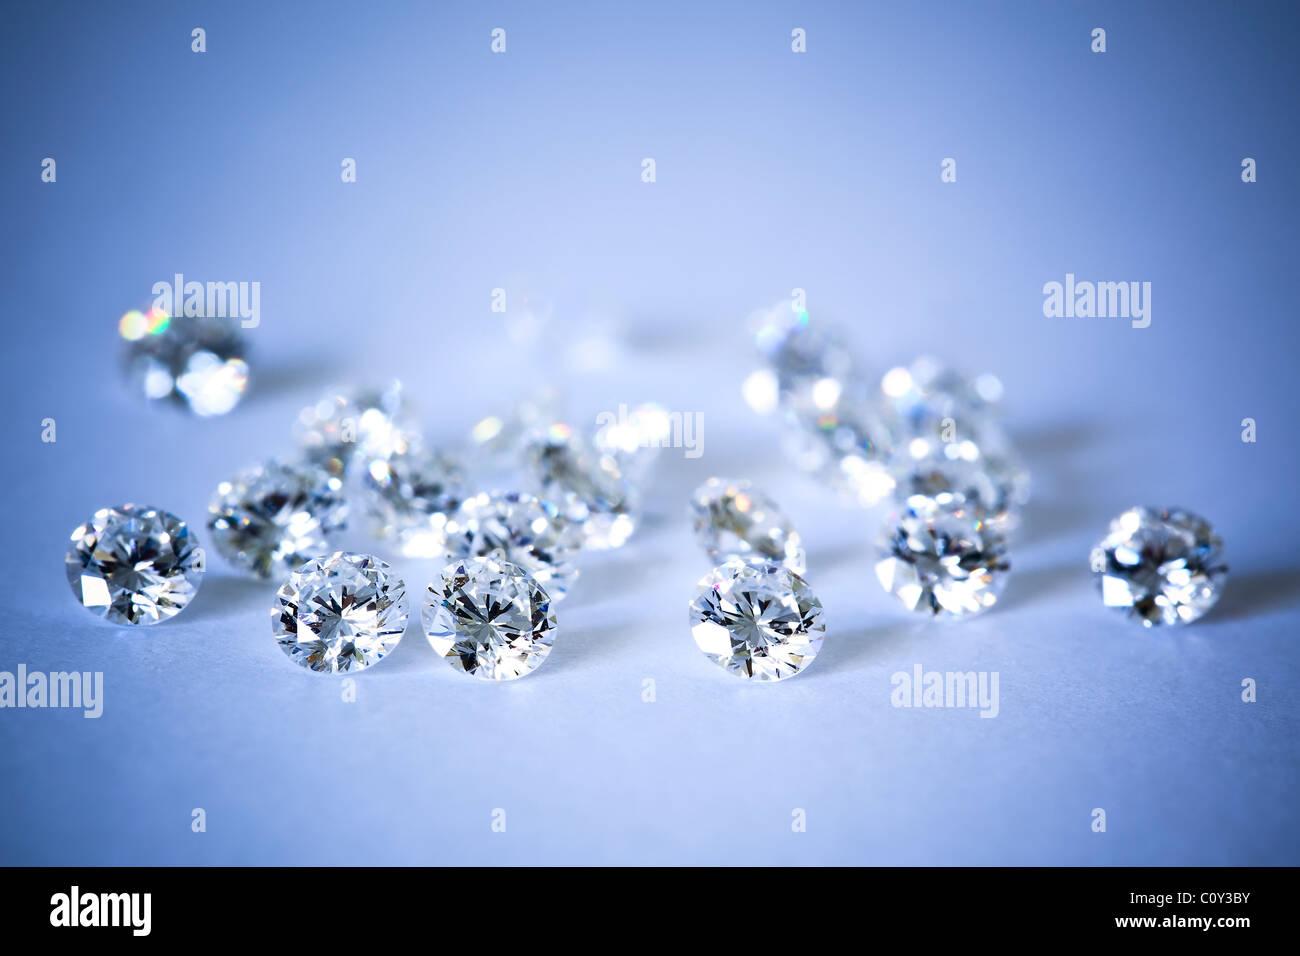 Lose Diamanten, runde Brillantschliff. Stockbild